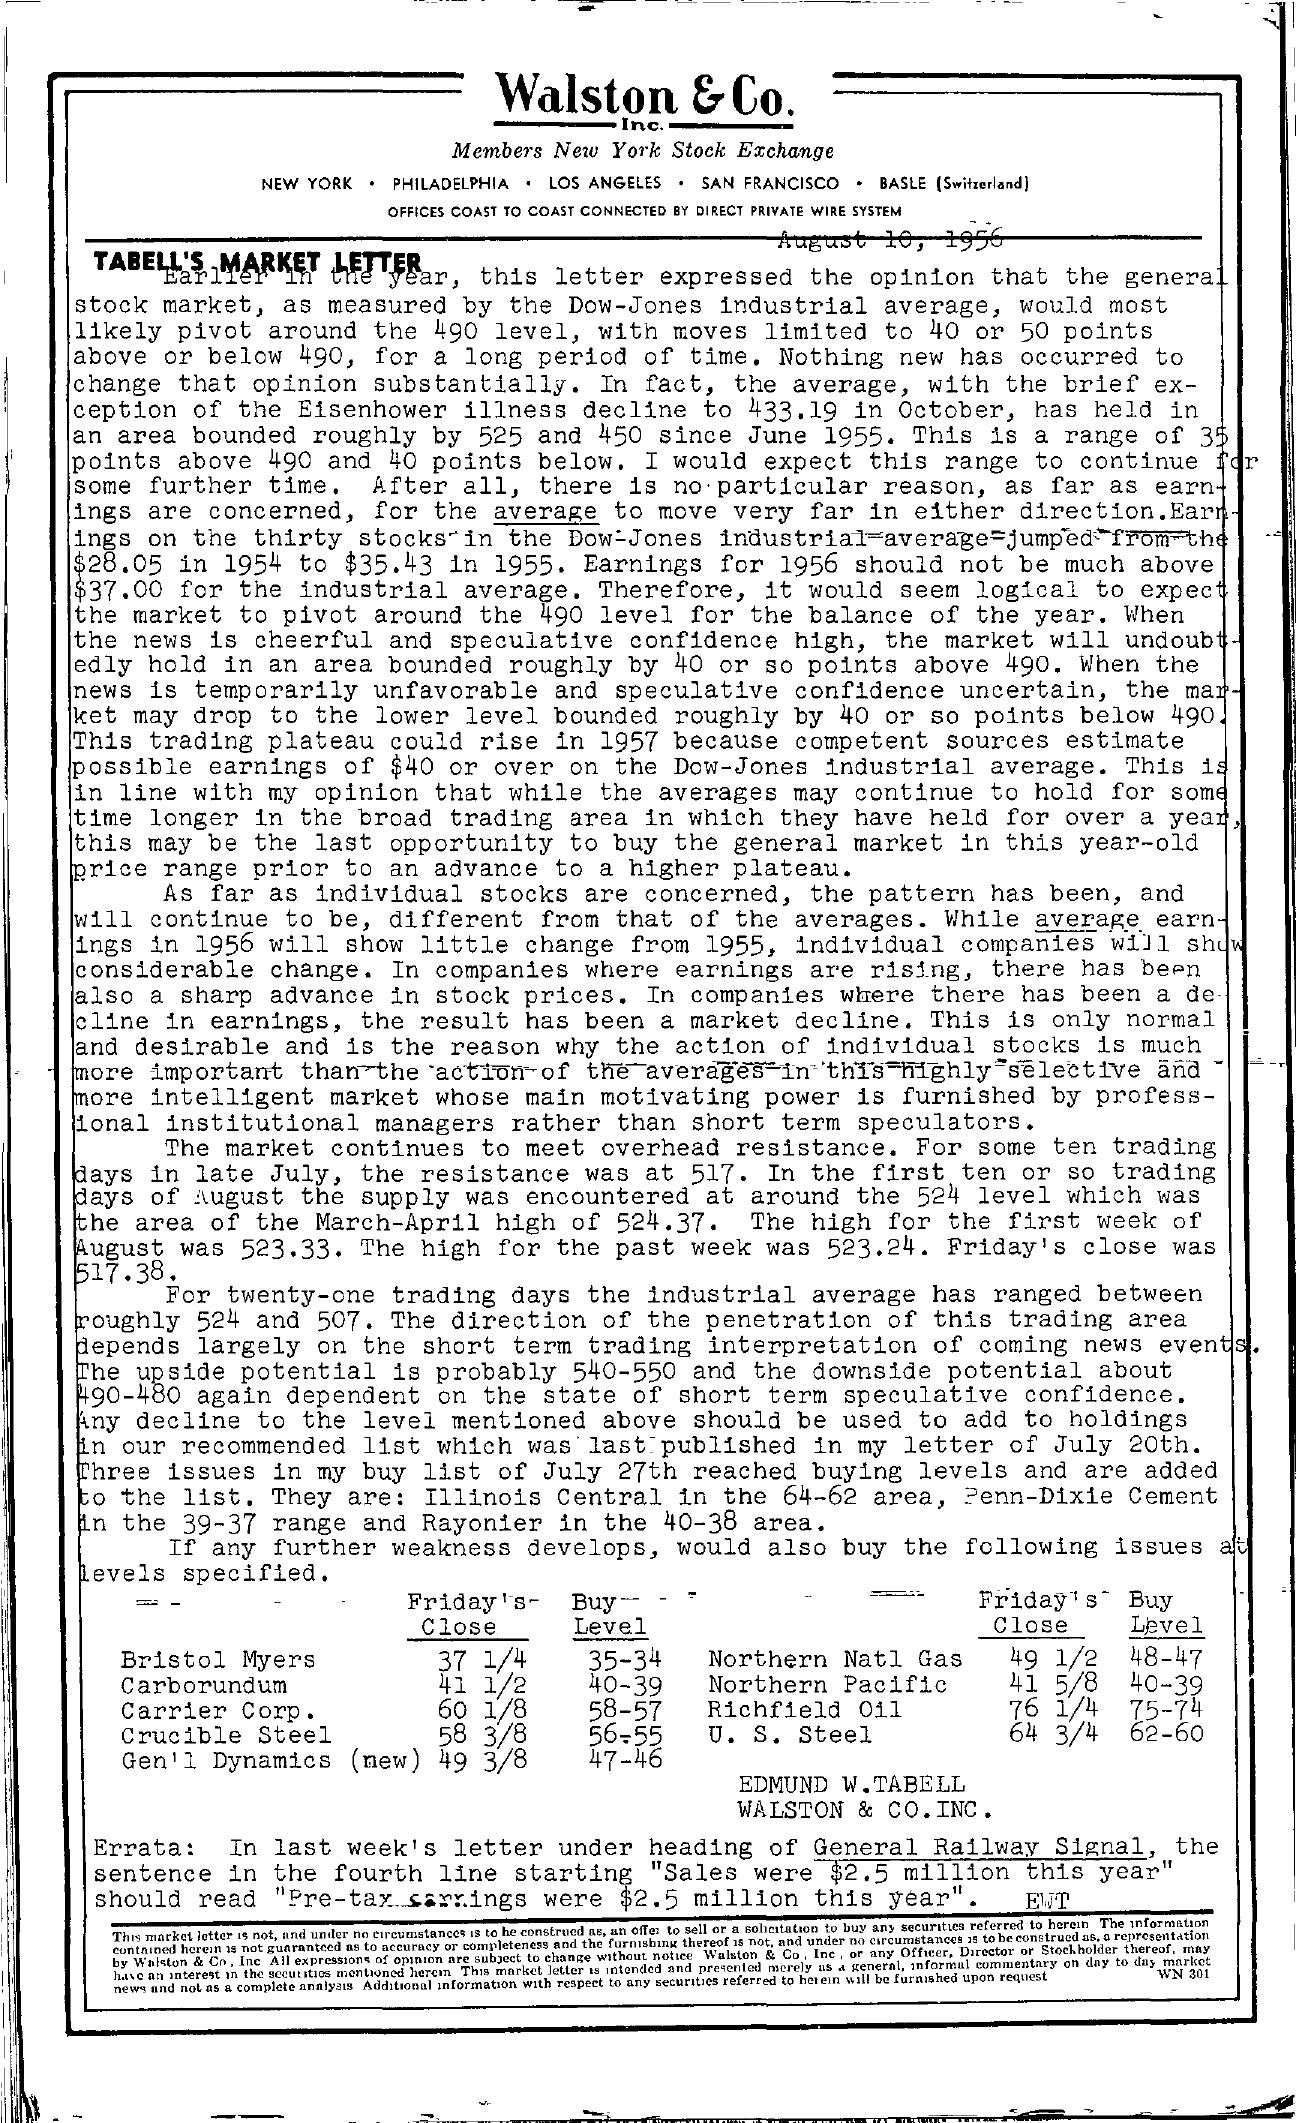 Tabell's Market Letter - August 10, 1956